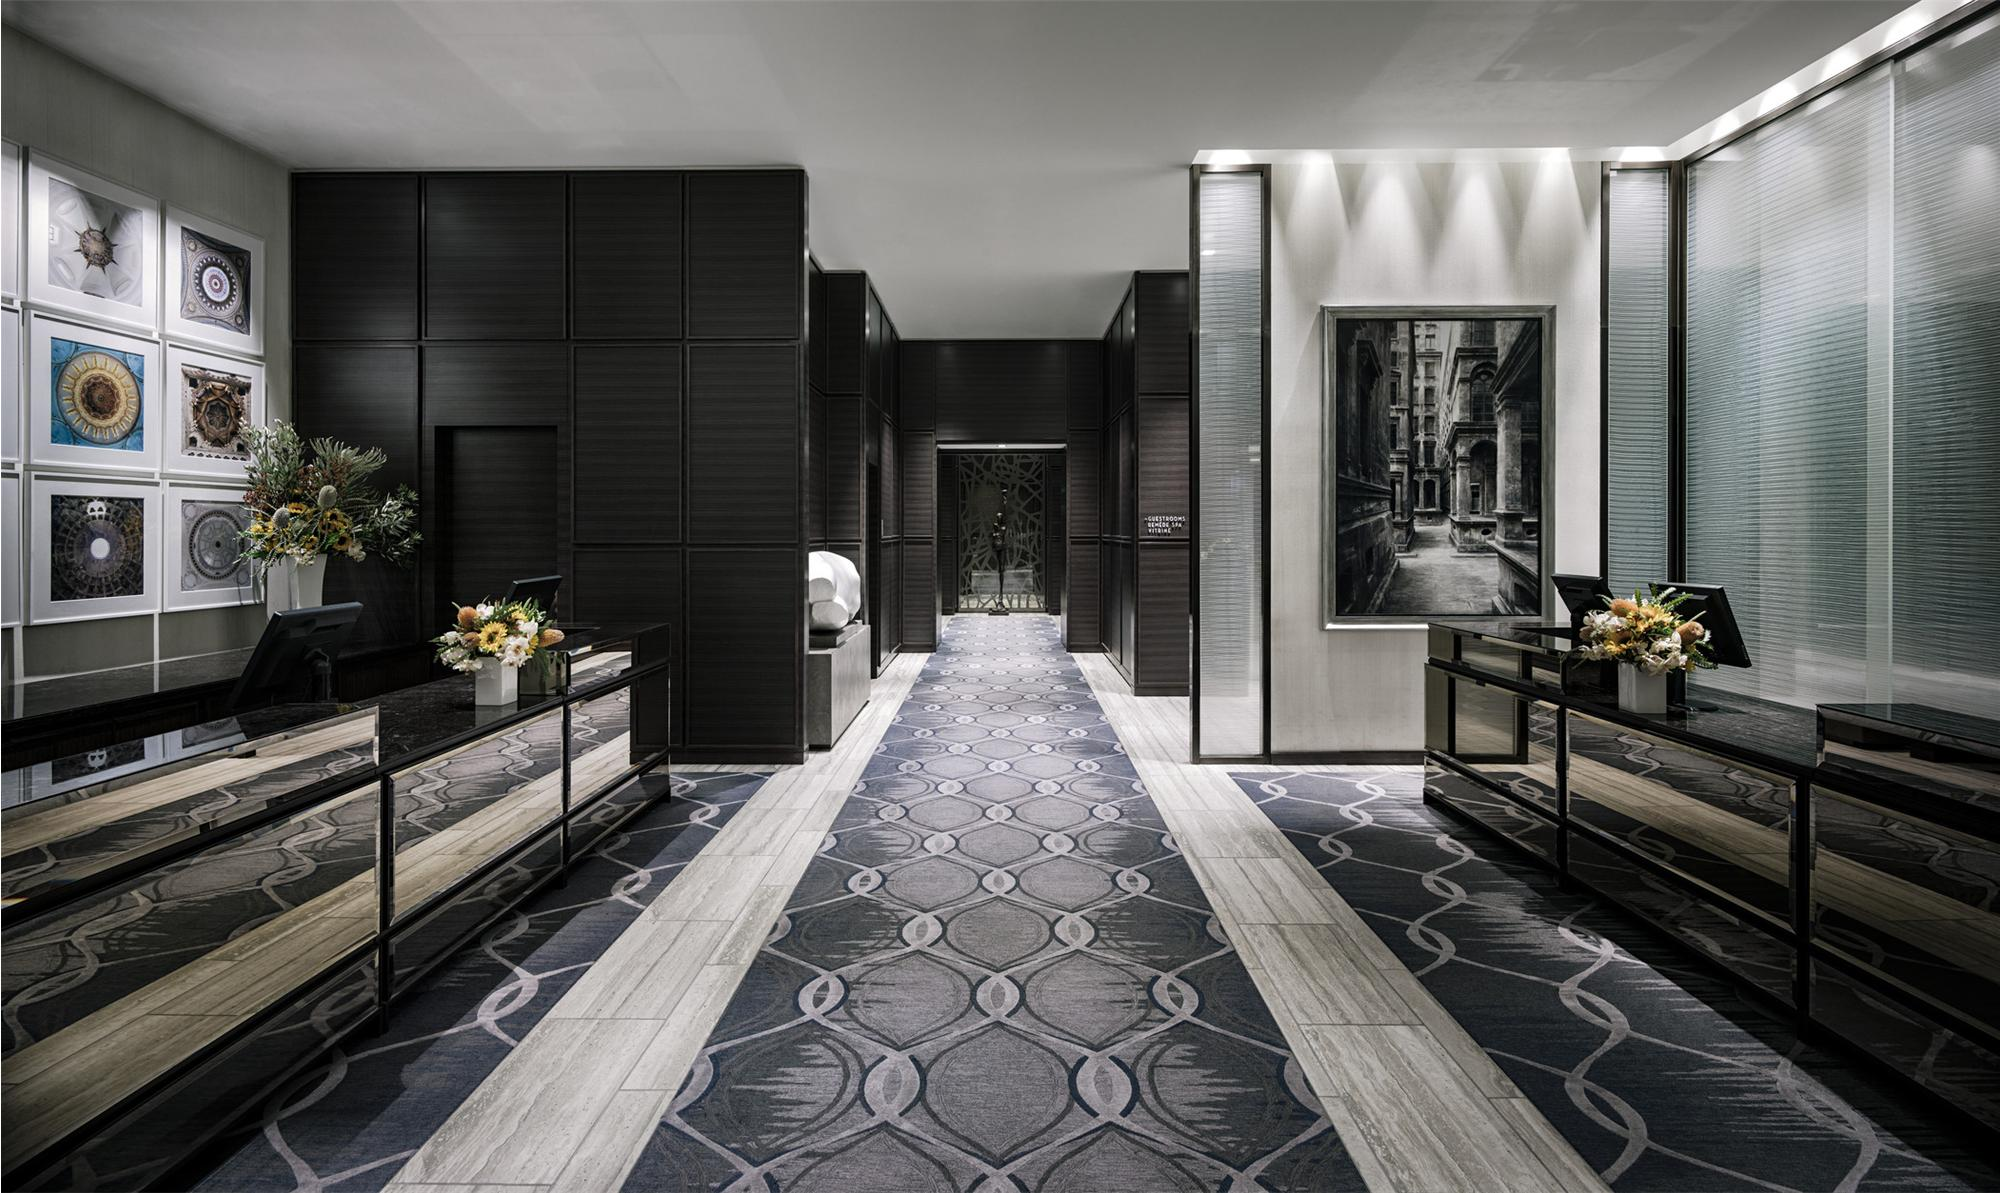 St regis san francisco california usa the luxury for San regis